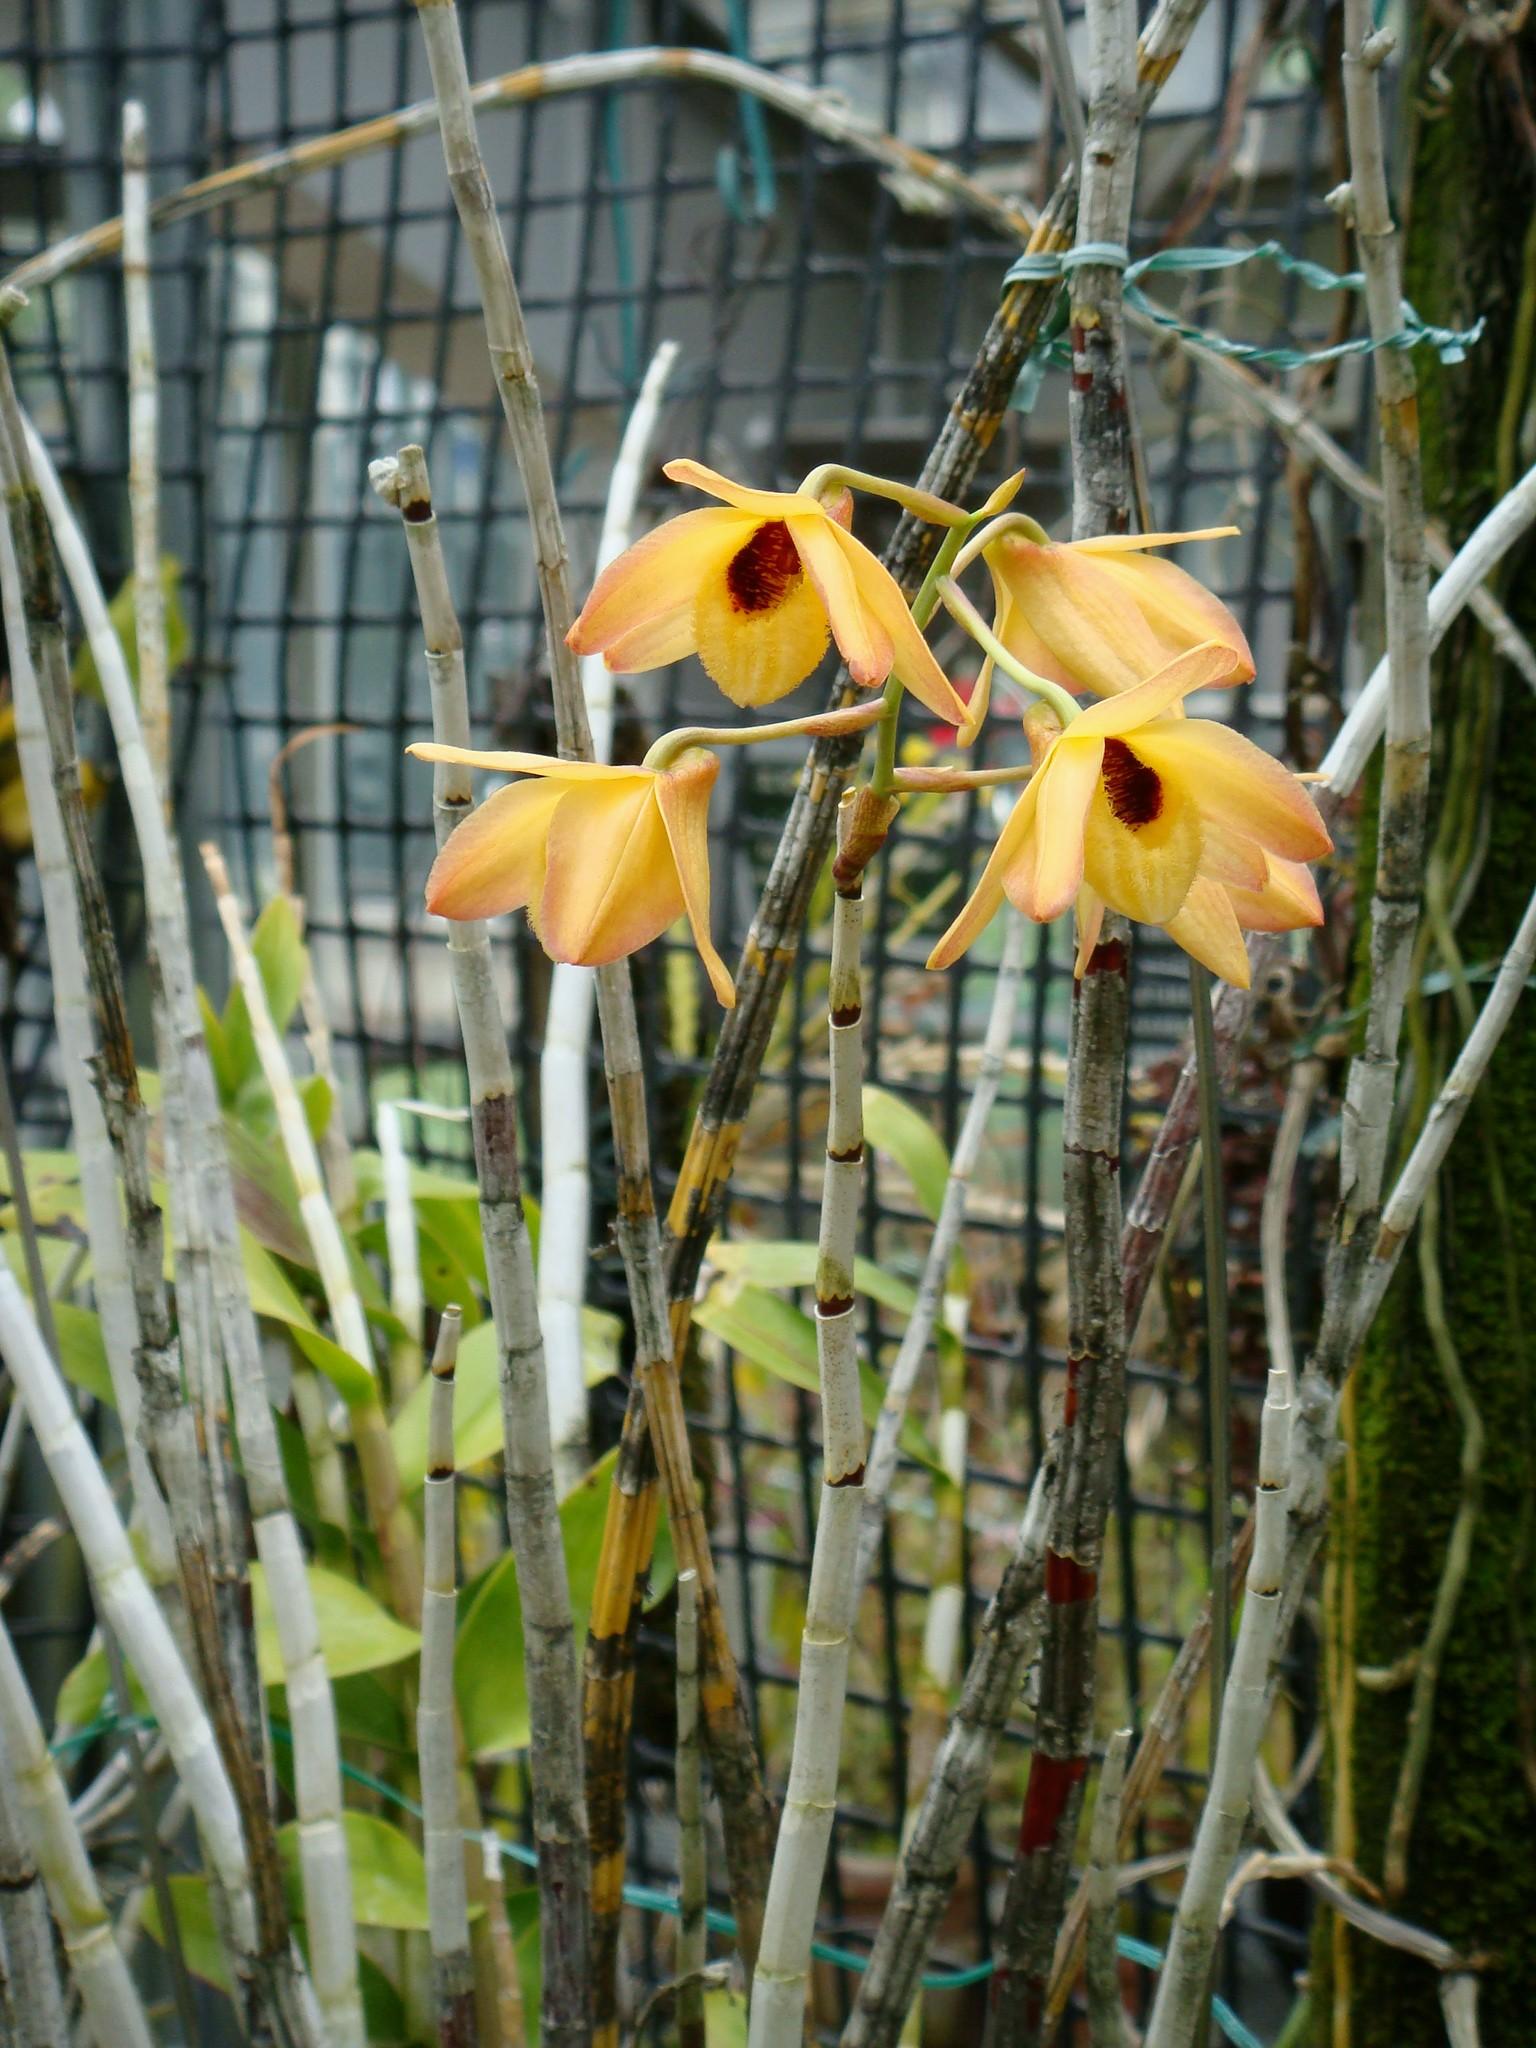 http://orchids.la.coocan.jp/Dendrobium/Dendrobium%20moschatum/DSC01044.JPG